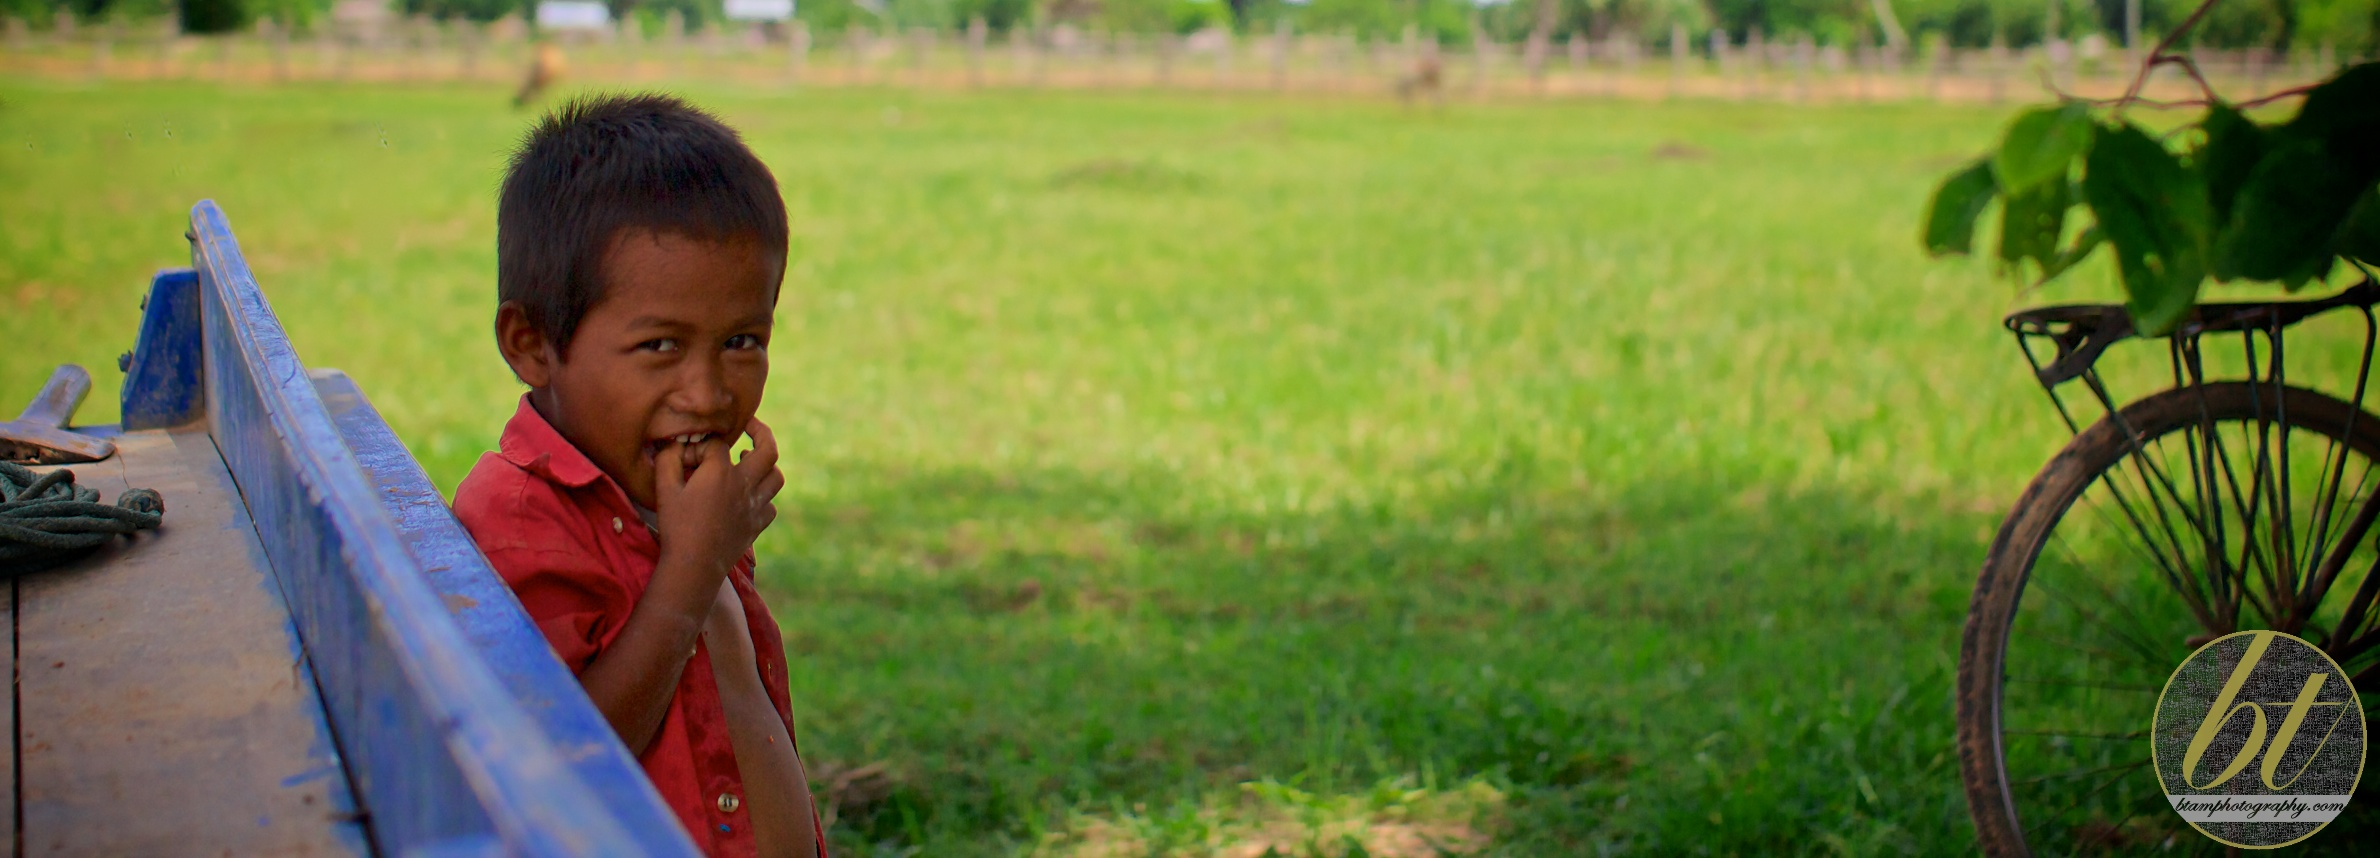 cambodian boy hanging around his family farm